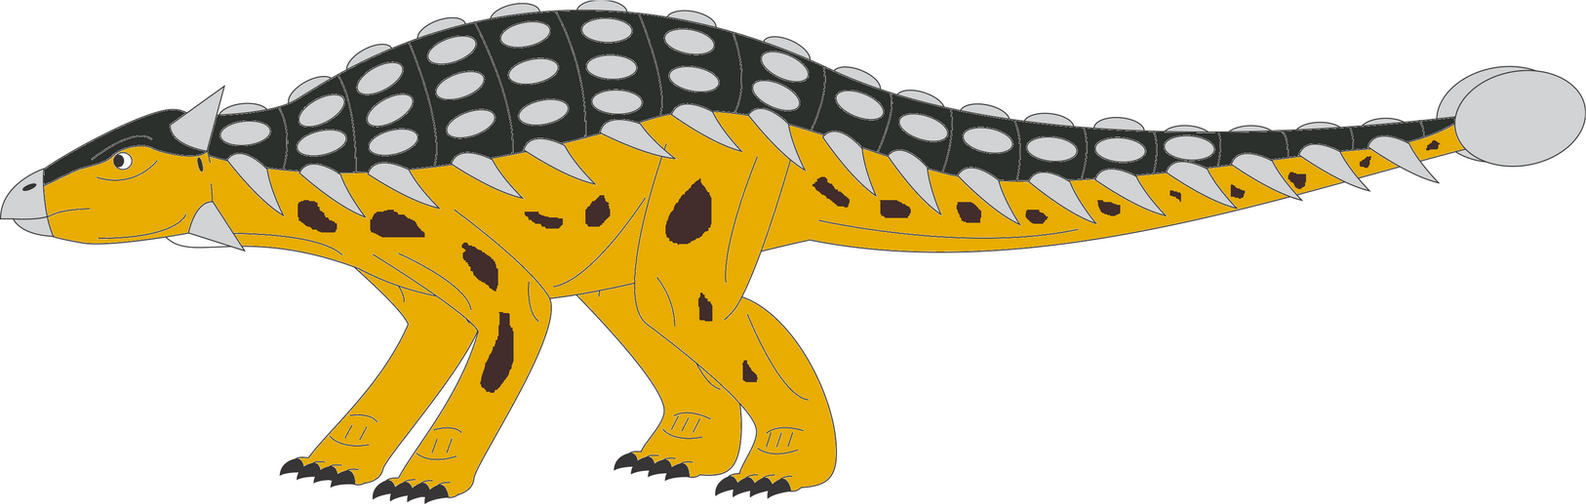 Walking with dinosaurs Ankylosaurus by ninjakingofhearts ...